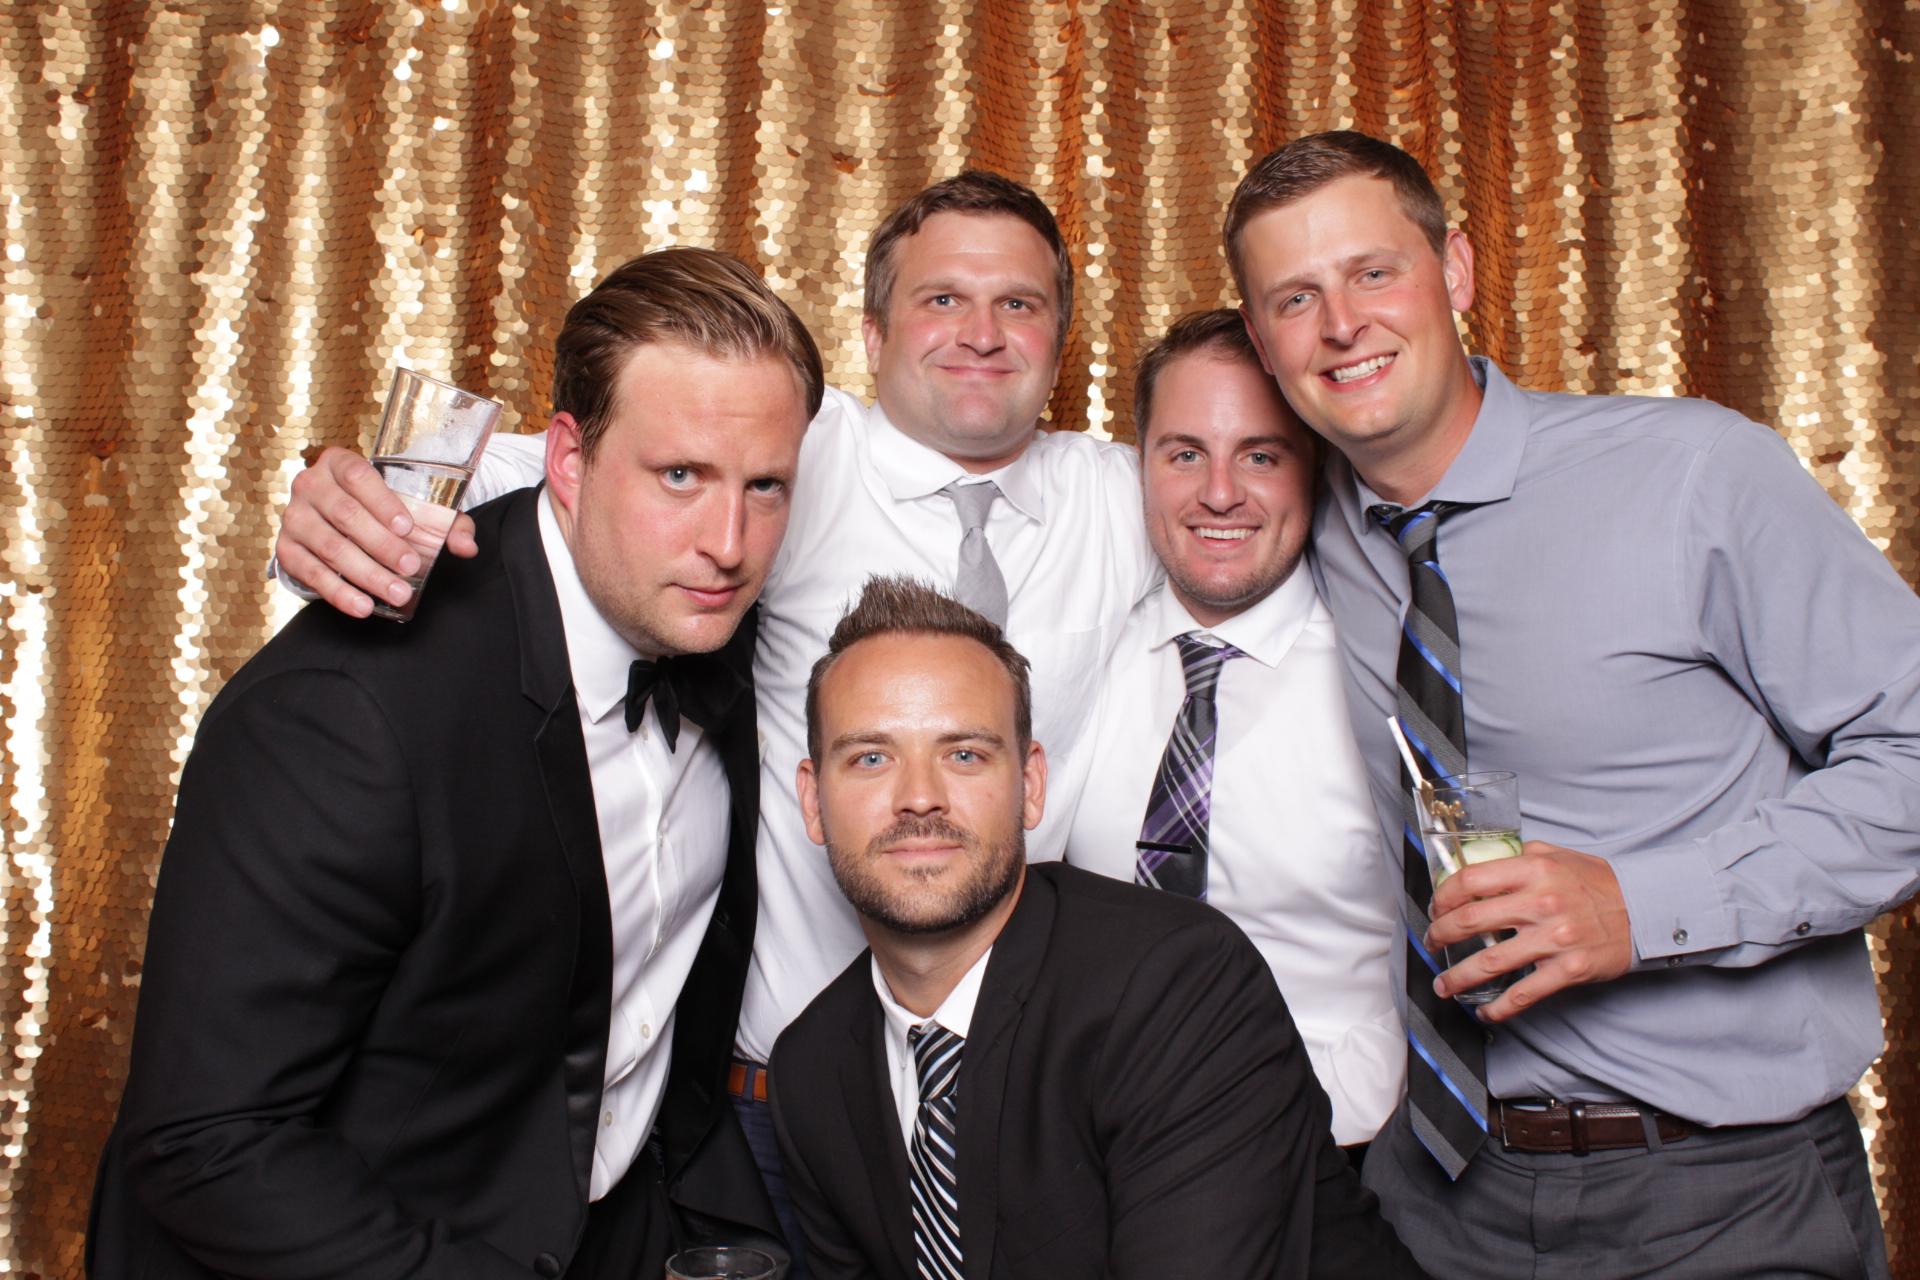 Minneapolis_wedding_photo_booth_Machine_Shop (13).jpg